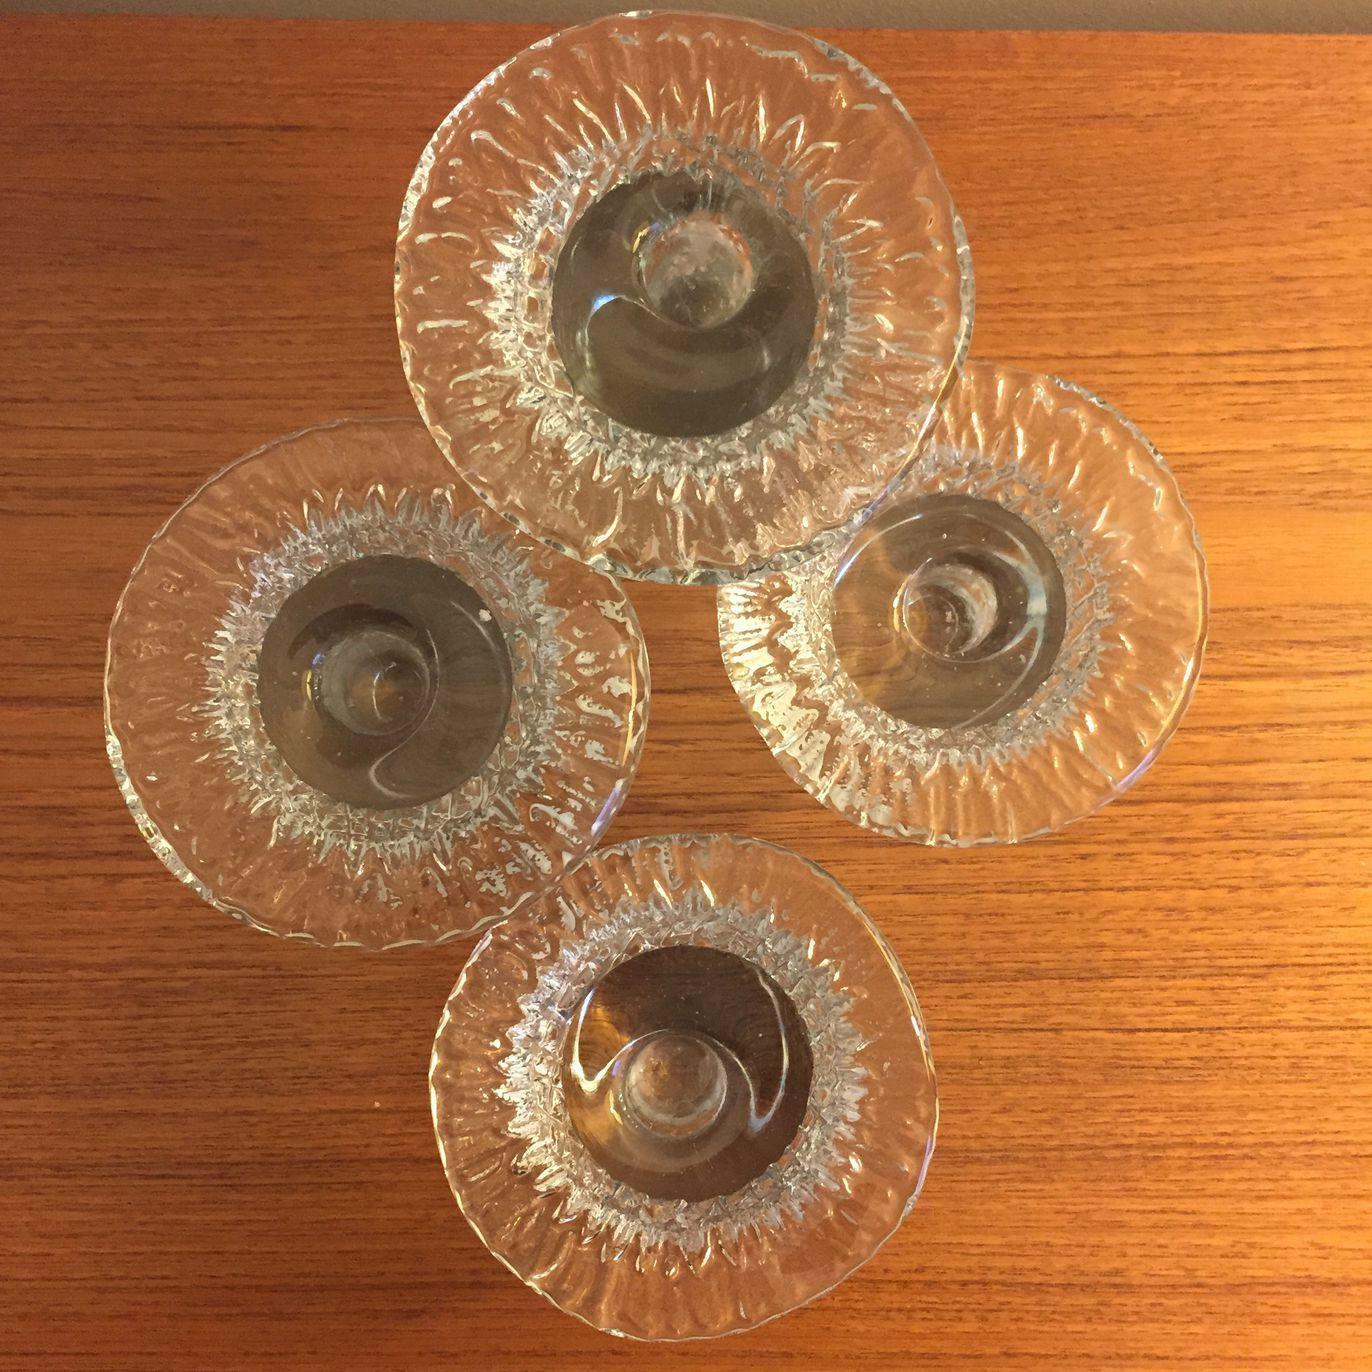 Vintage blenko glass mushroom candle holders set of research